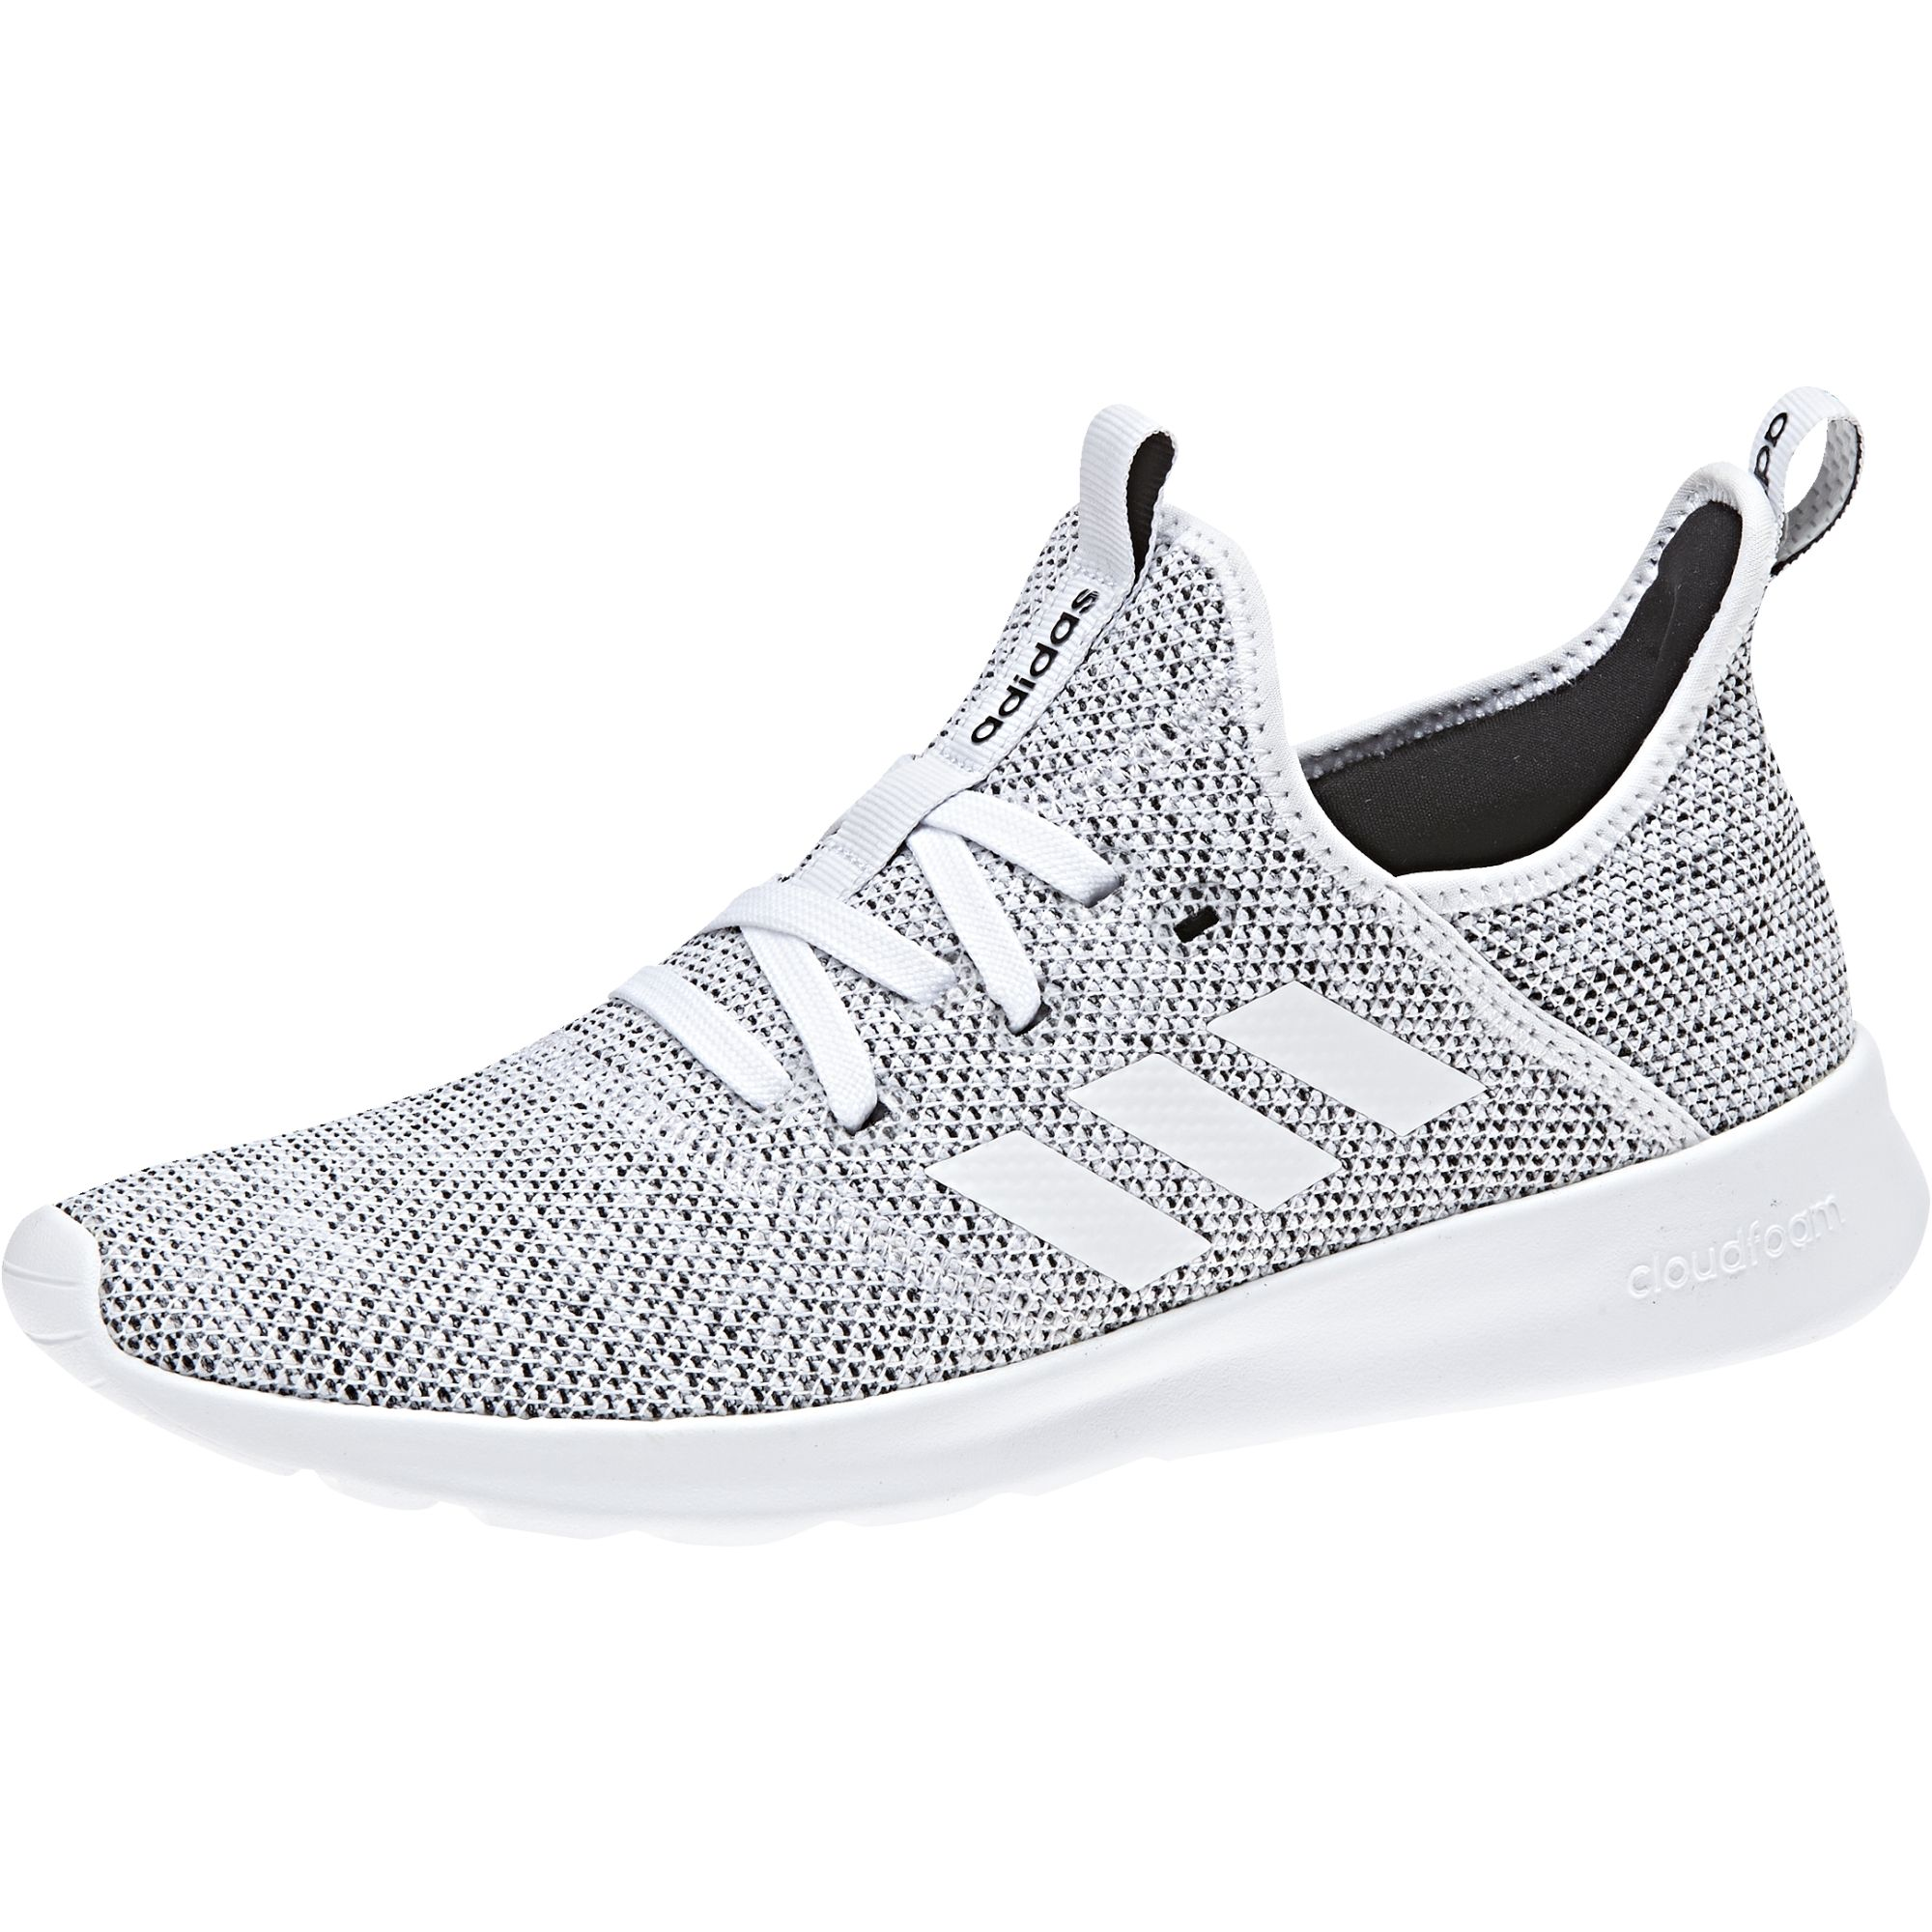 Akciós PURE Markasbolt Hivatalos hu CLOUDFOAM cipő női Adidas 4wS4BO